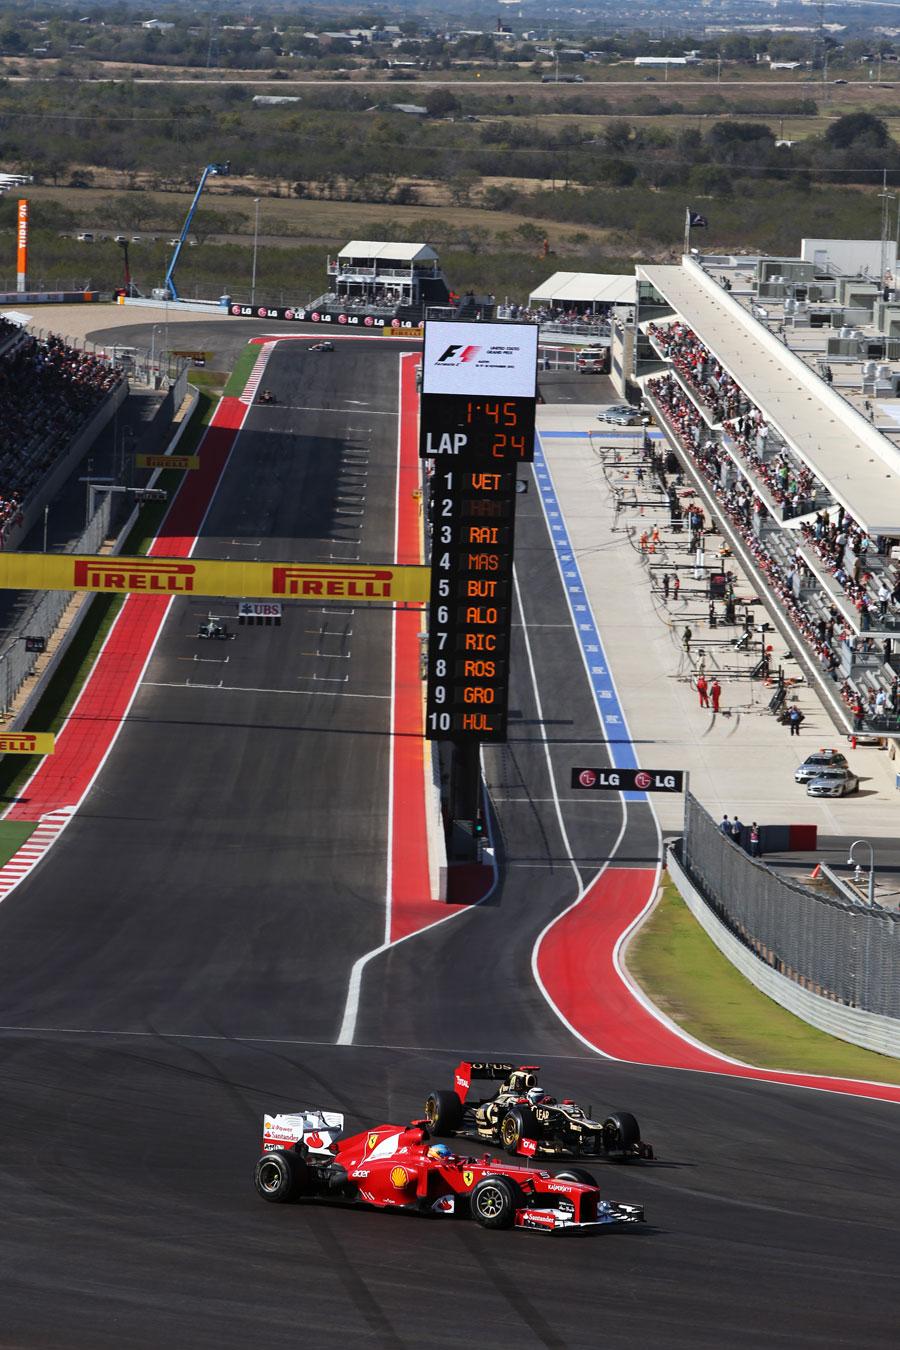 Kimi Raikkonen rejoins behind Fernando Alonso